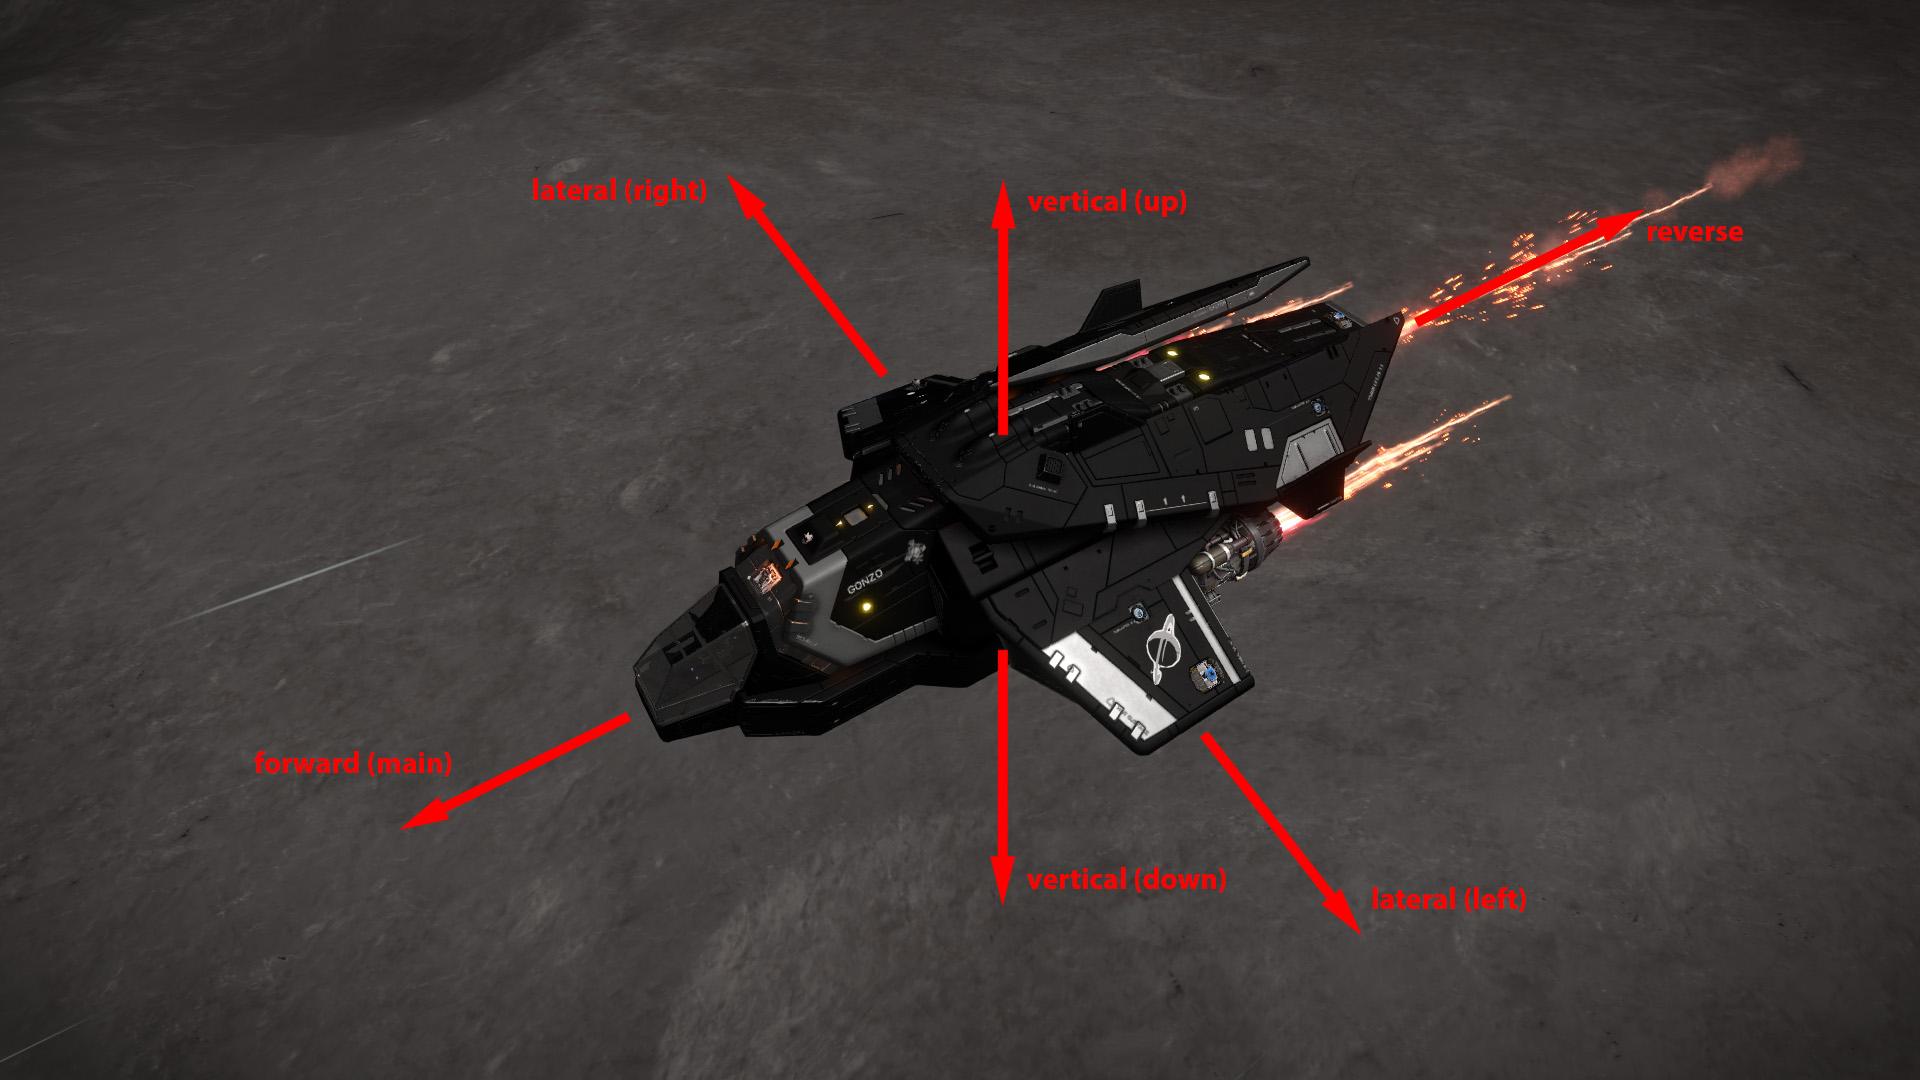 thrust directions